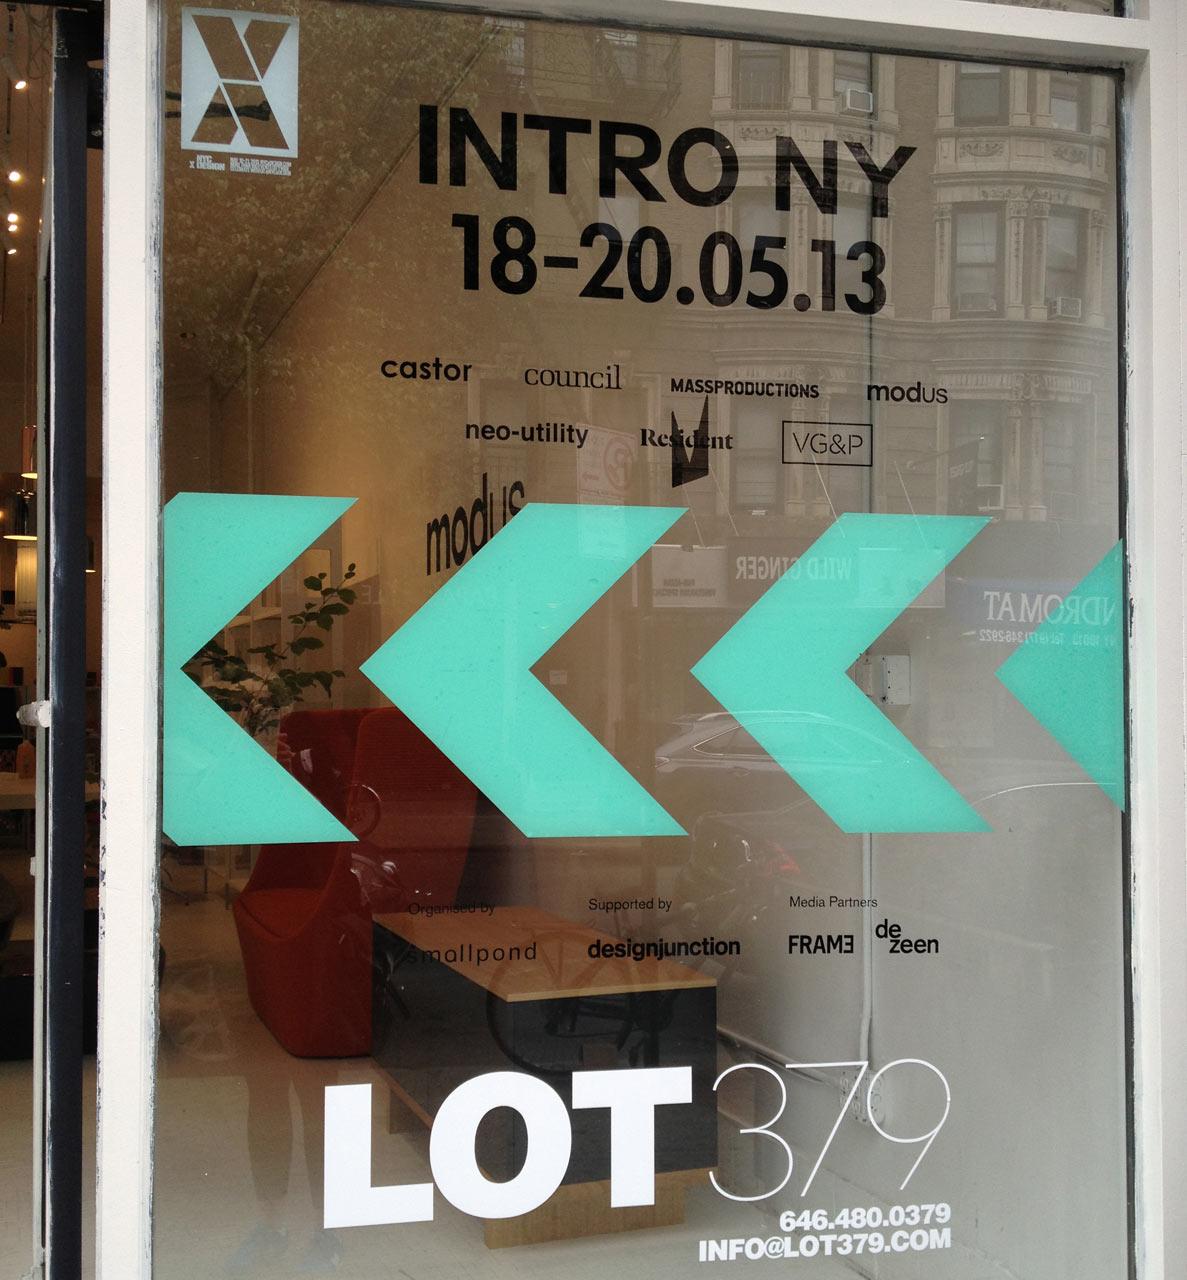 intro-ny-signage